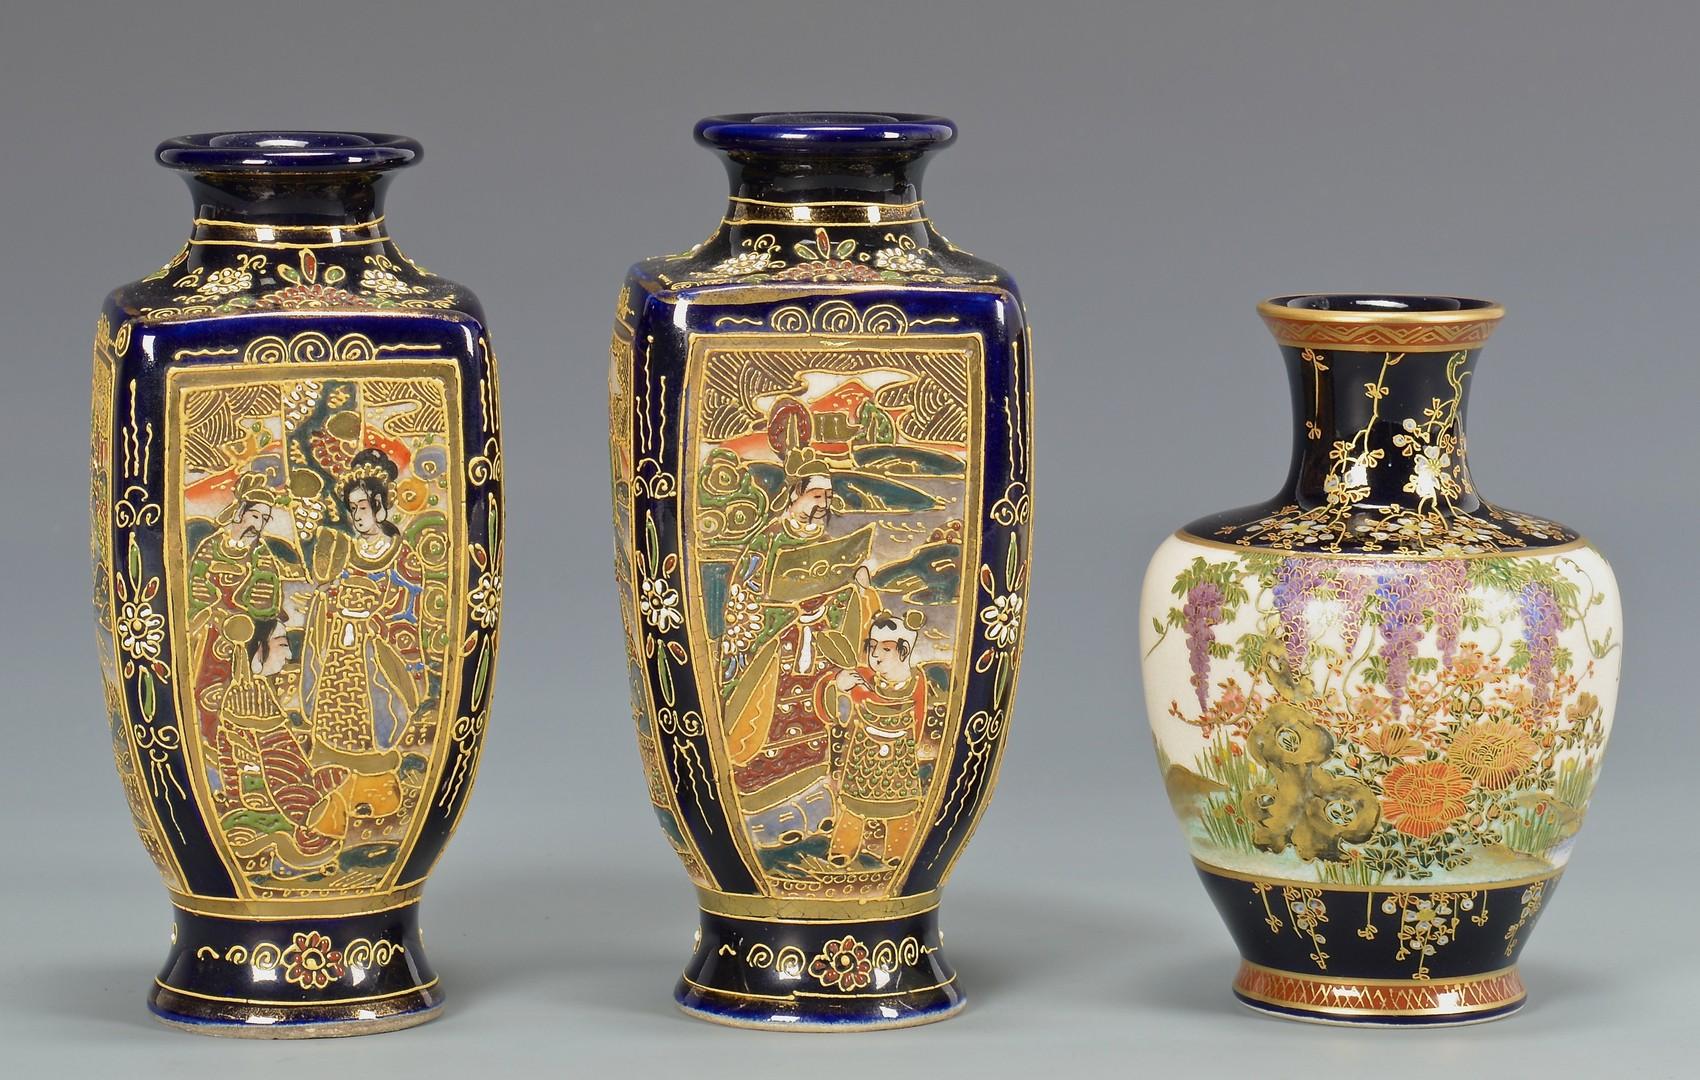 Lot 777: Group of Japanese Satsuma Pottery, 6 items